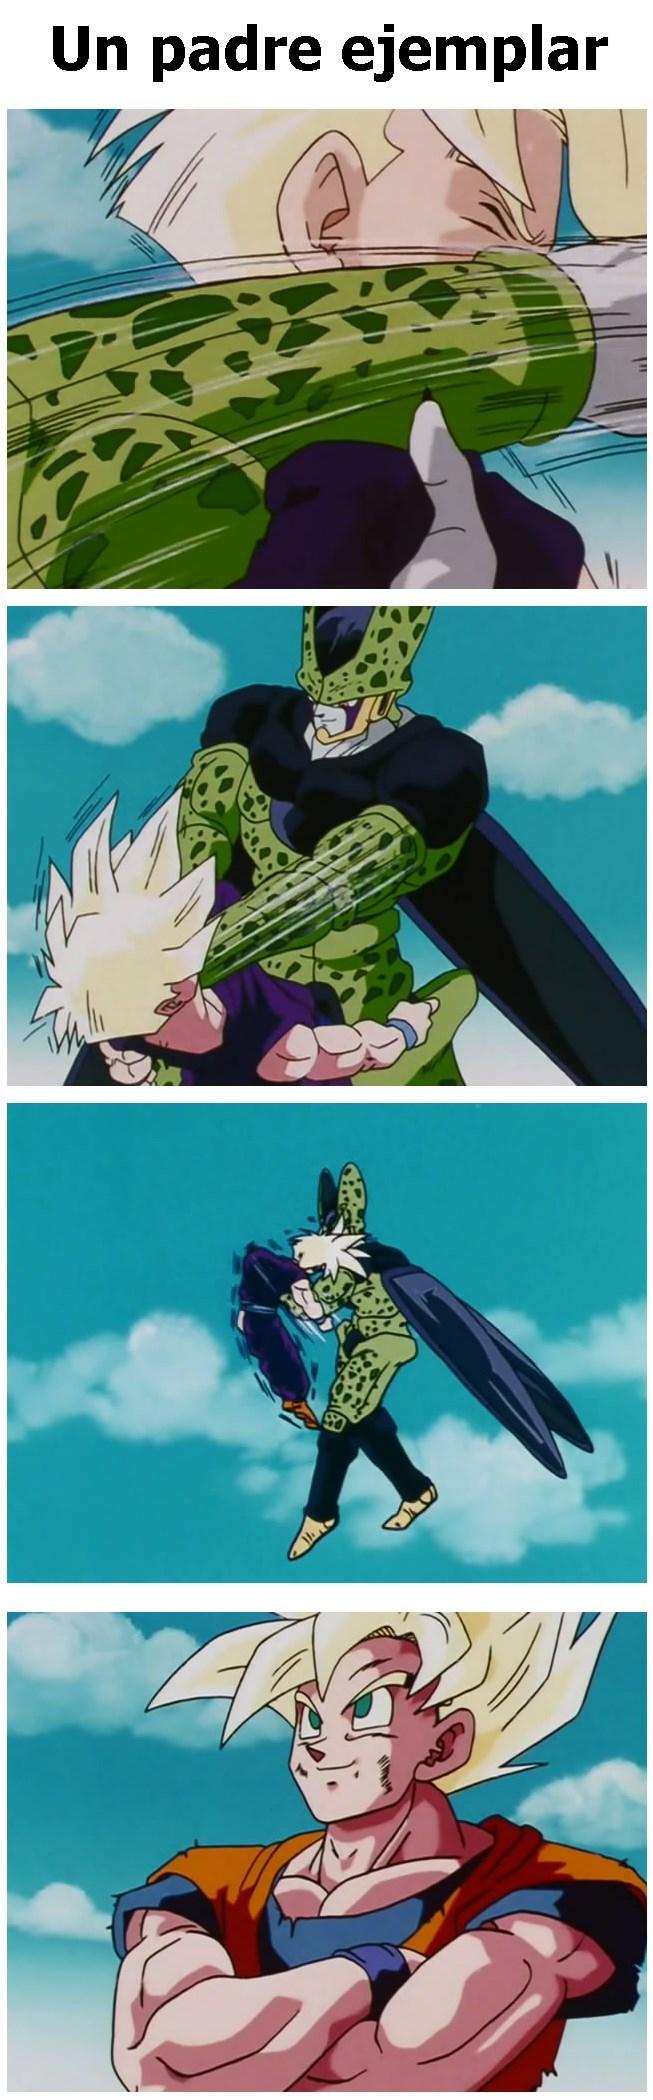 goku ejemplo de padre